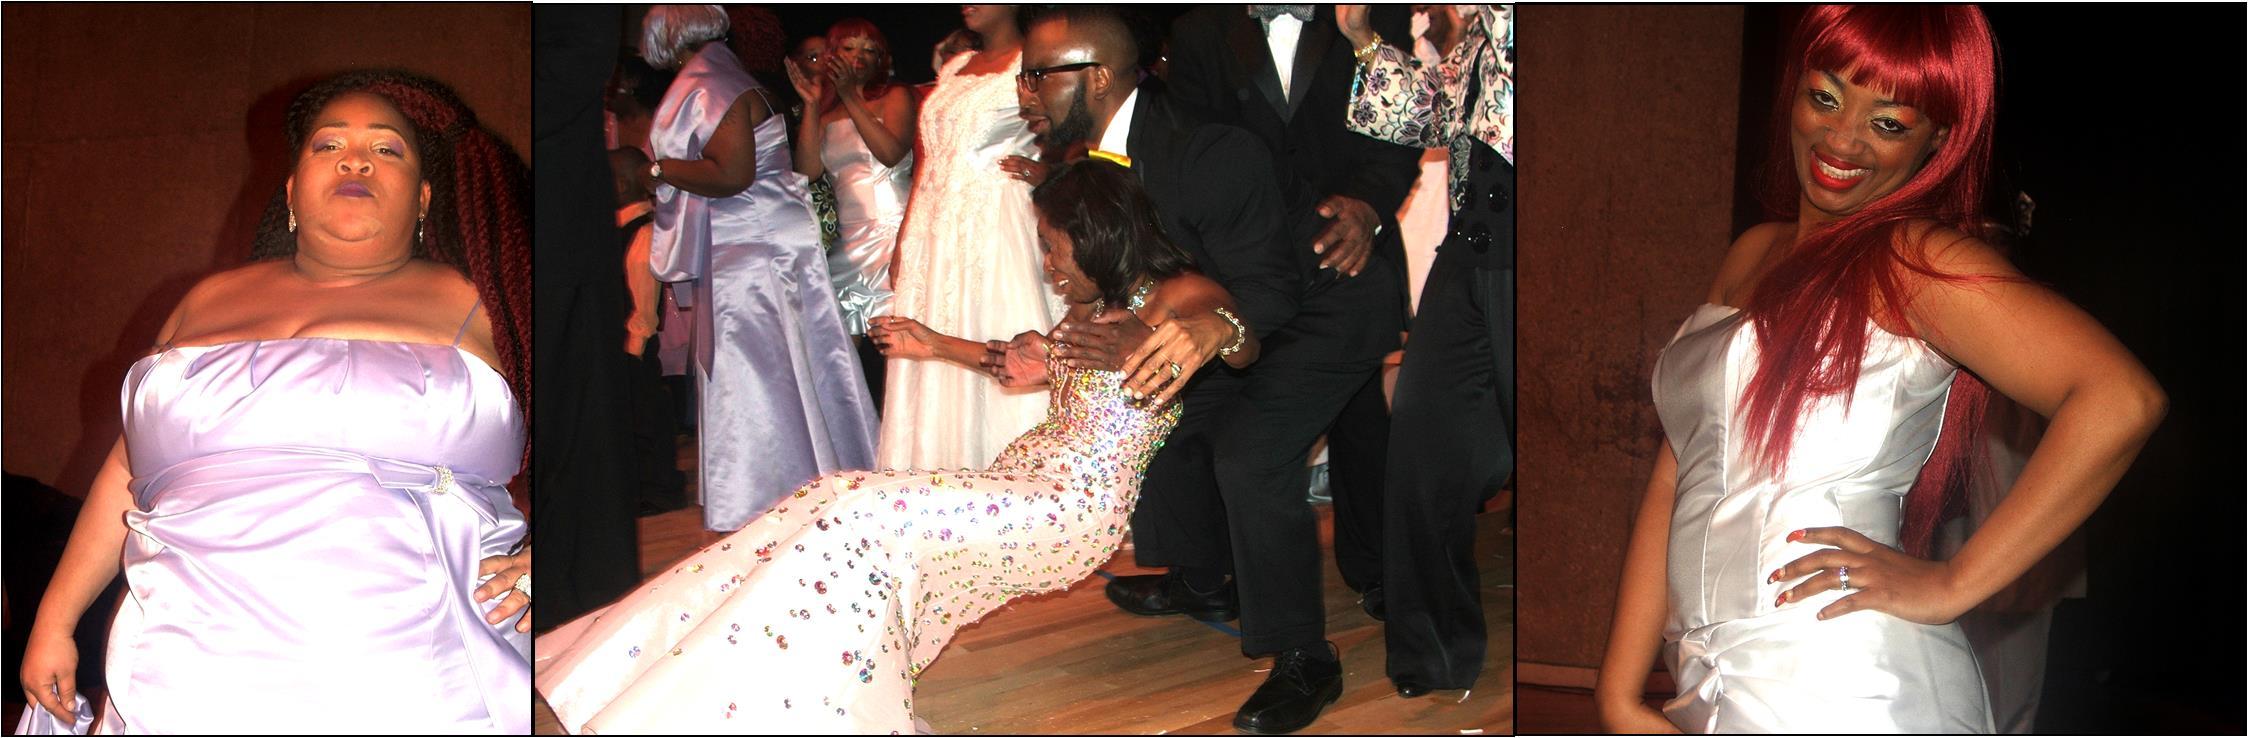 My Big Phat Ghetto FABULE$$ Wedding Performance Photos